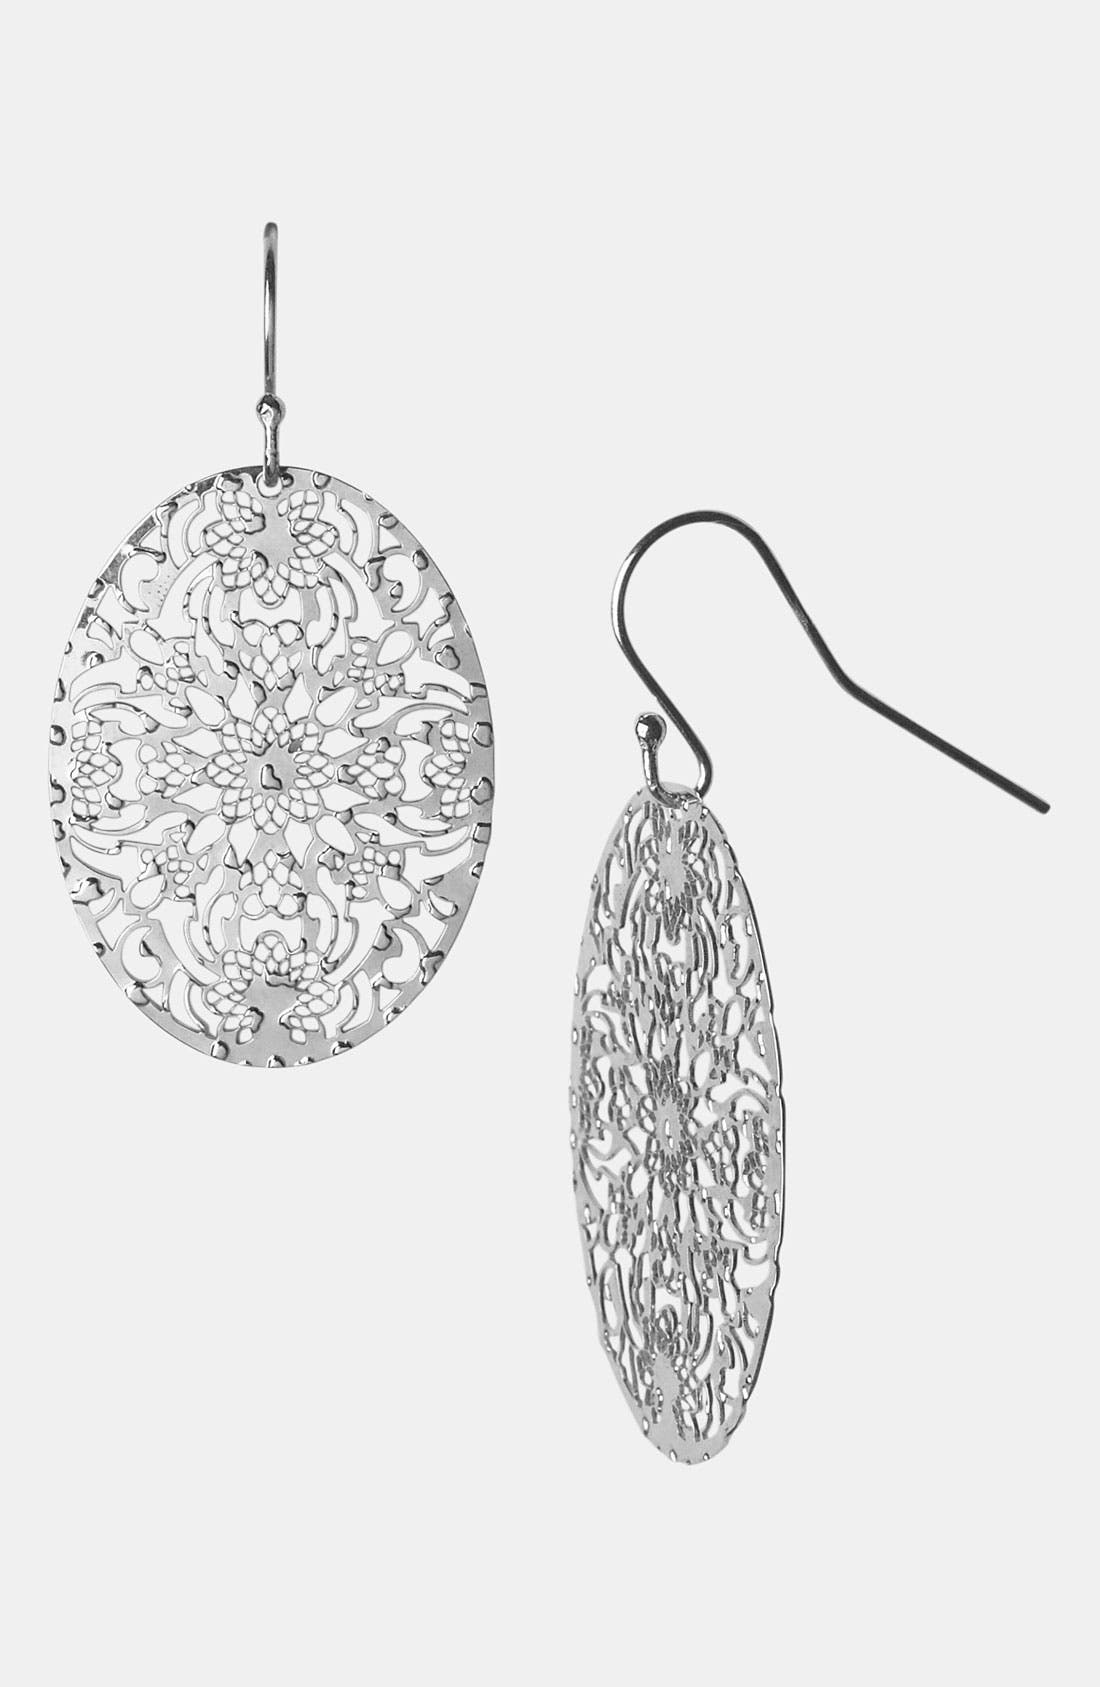 Alternate Image 1 Selected - Argento Vivo 'Mini' Drop Earrings (Nordstrom Online Exclusive)